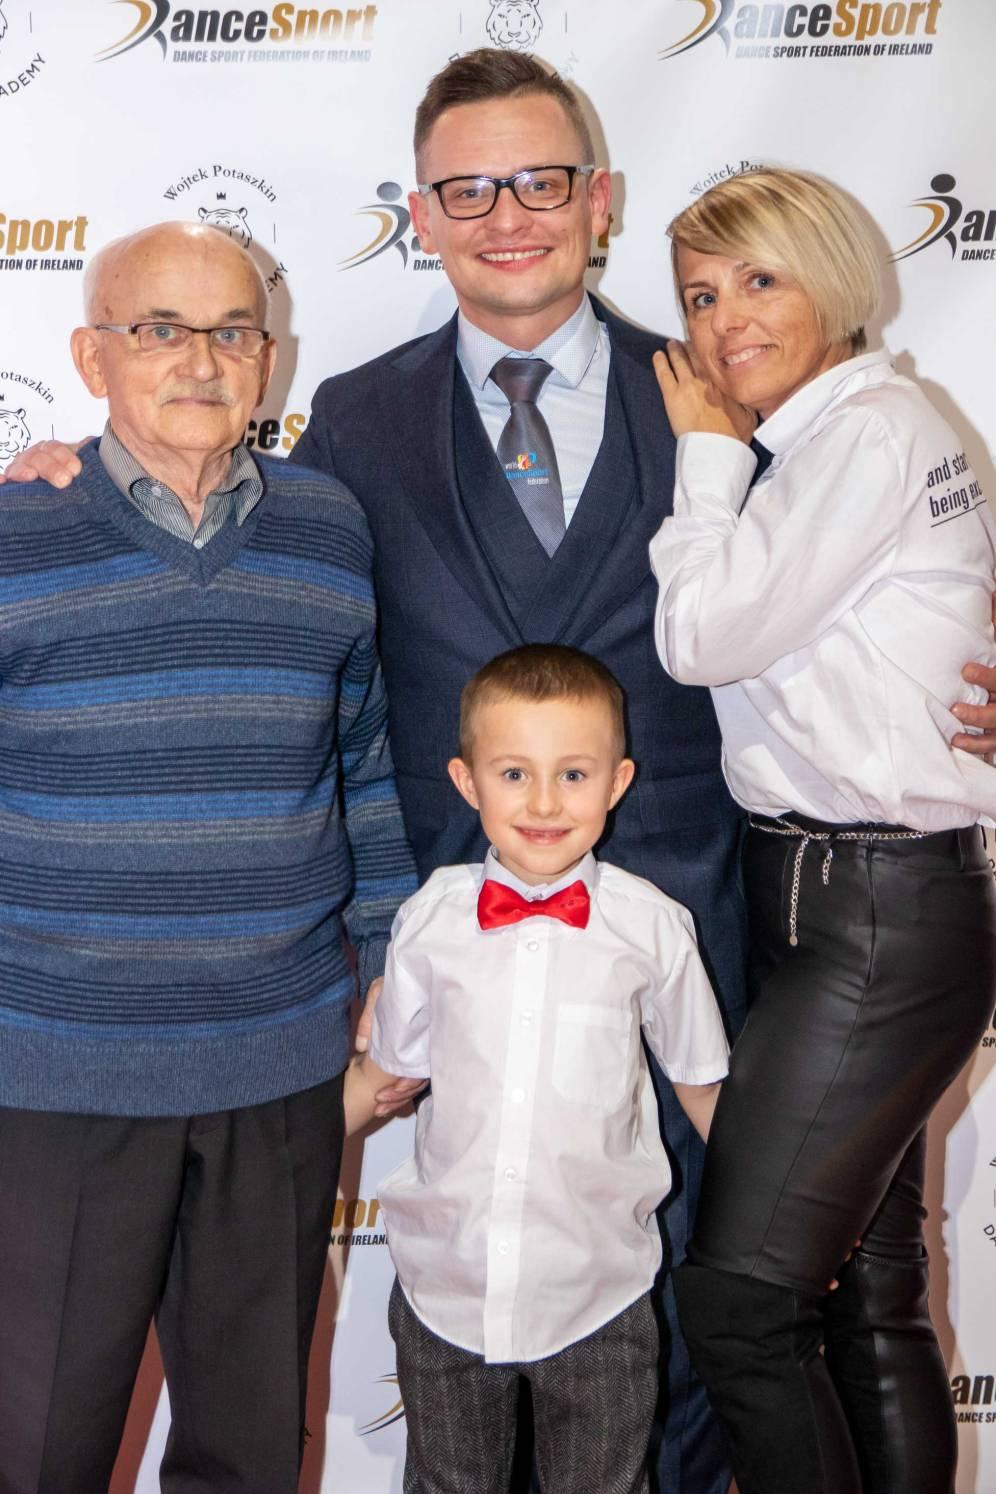 Family Potaszkin